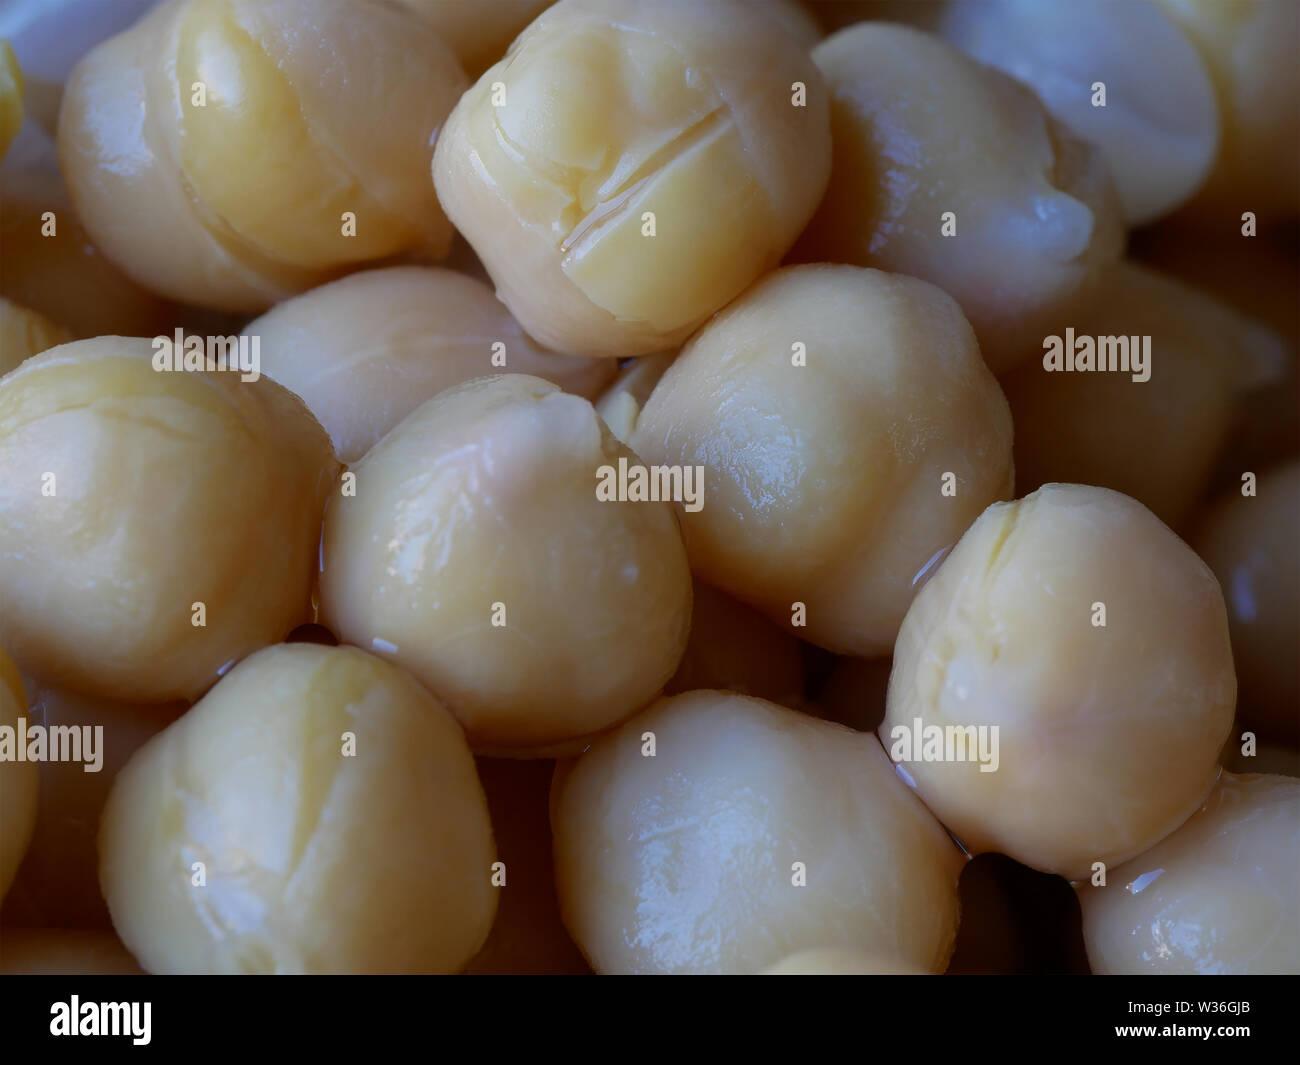 Macro Close-up of Wet Yellow Chickpeas, Cicer arietinum, Food Background Stock Photo